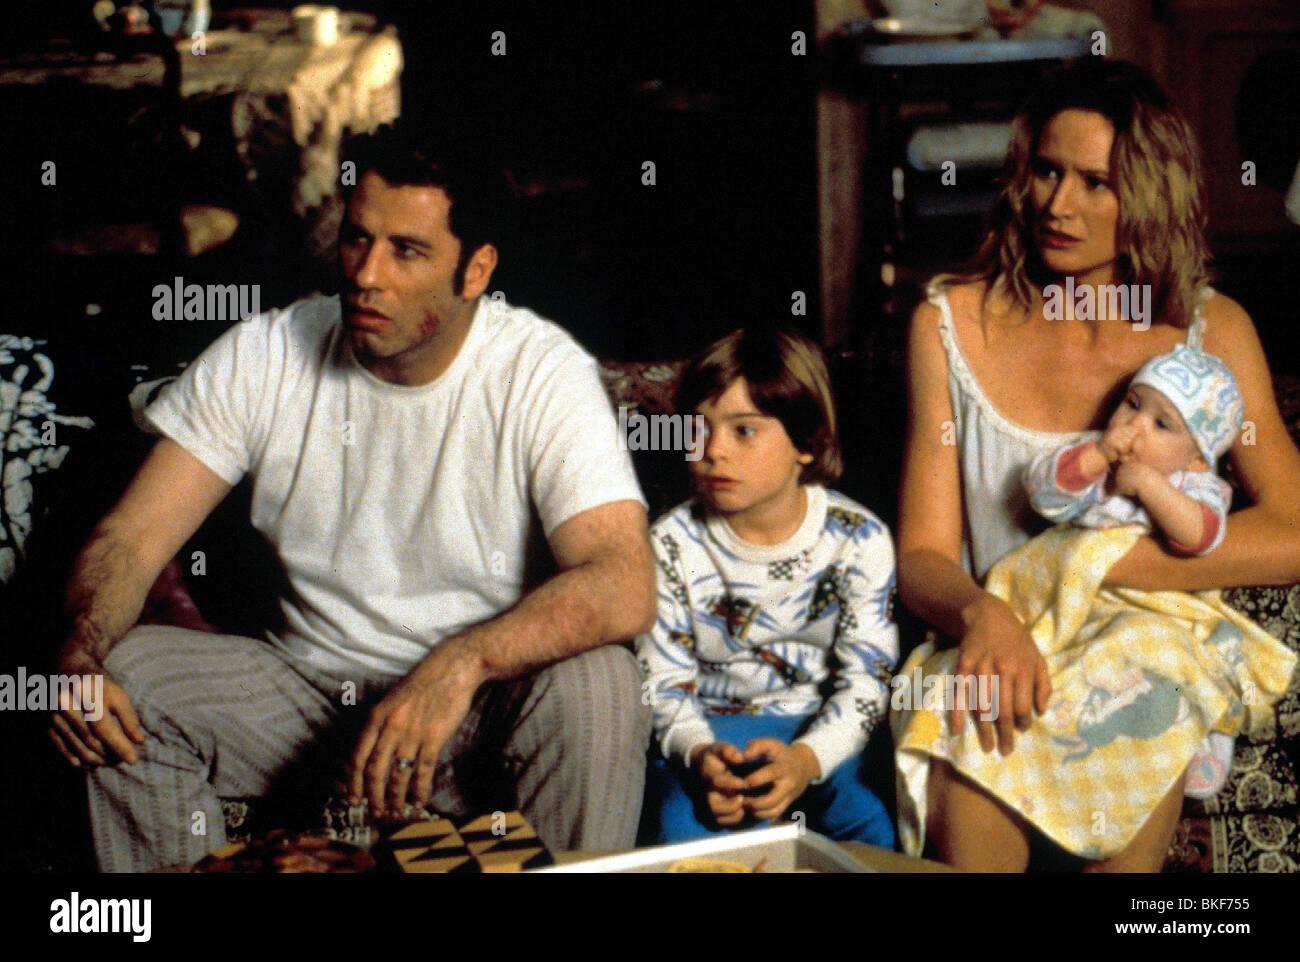 WHITE MAN'S BURDEN (1995) JOHN TRAVOLTA, KELLY LYNCH WMB 003 - Stock Image